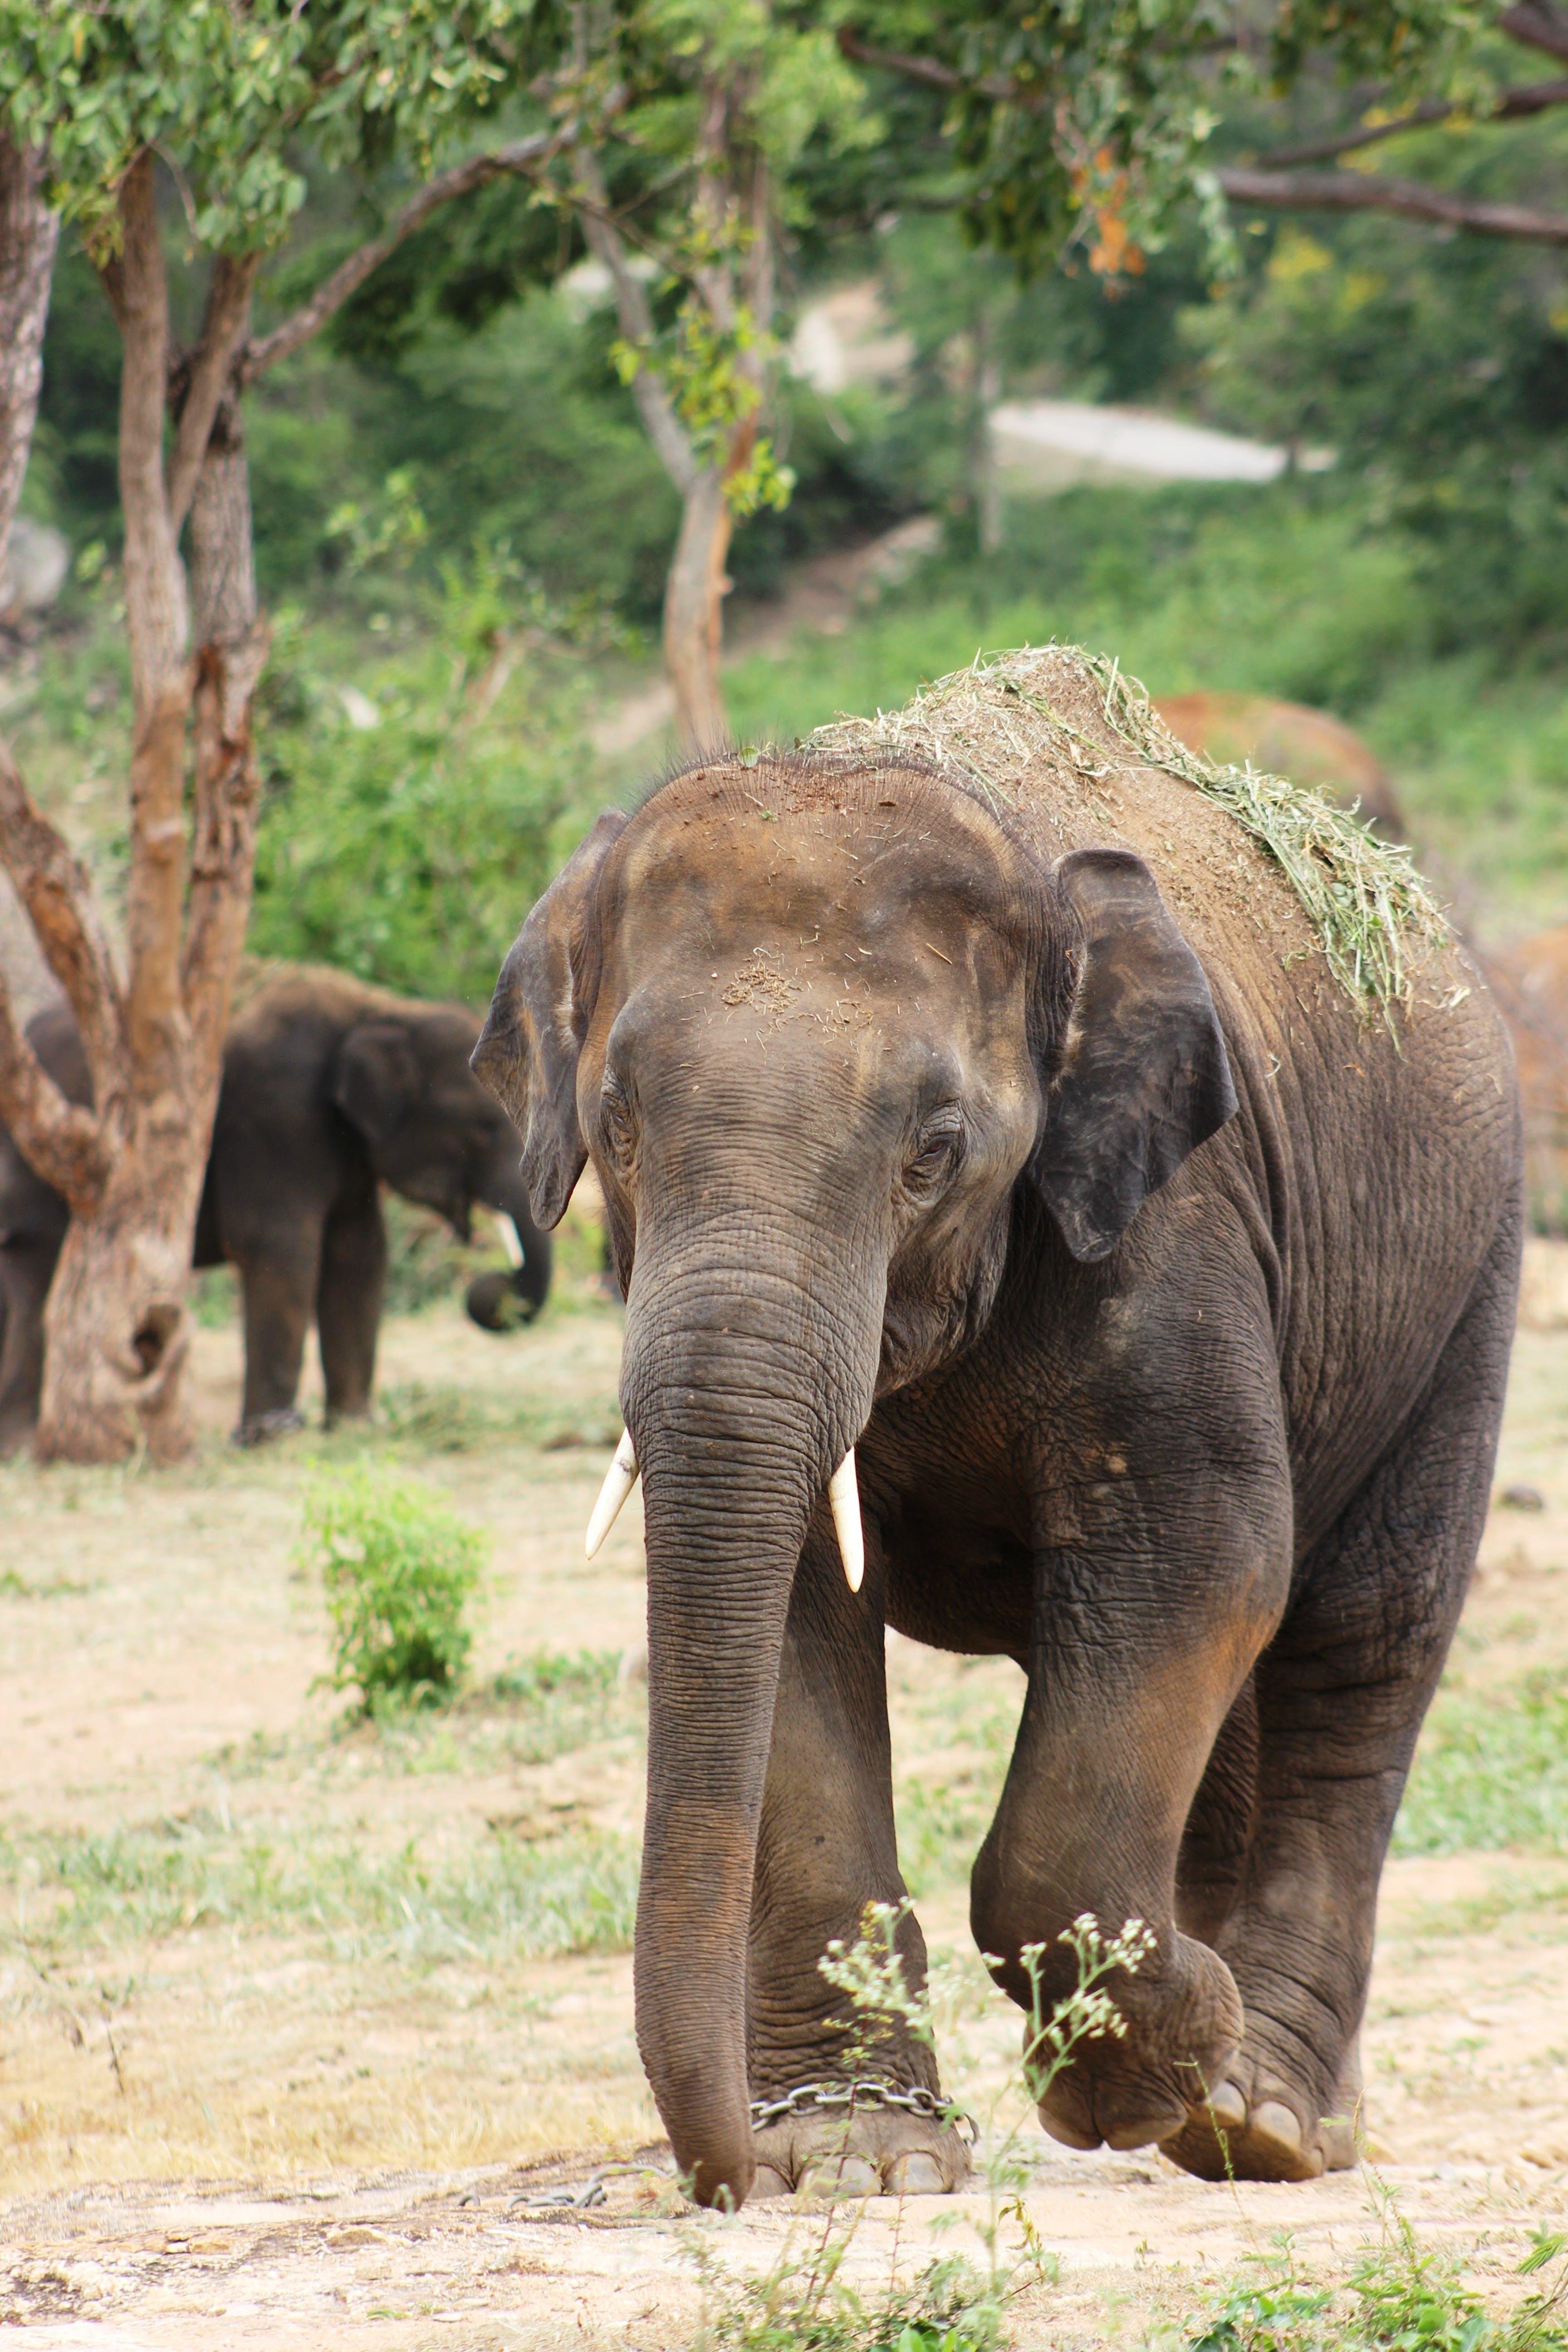 Brown Elephant on Ground